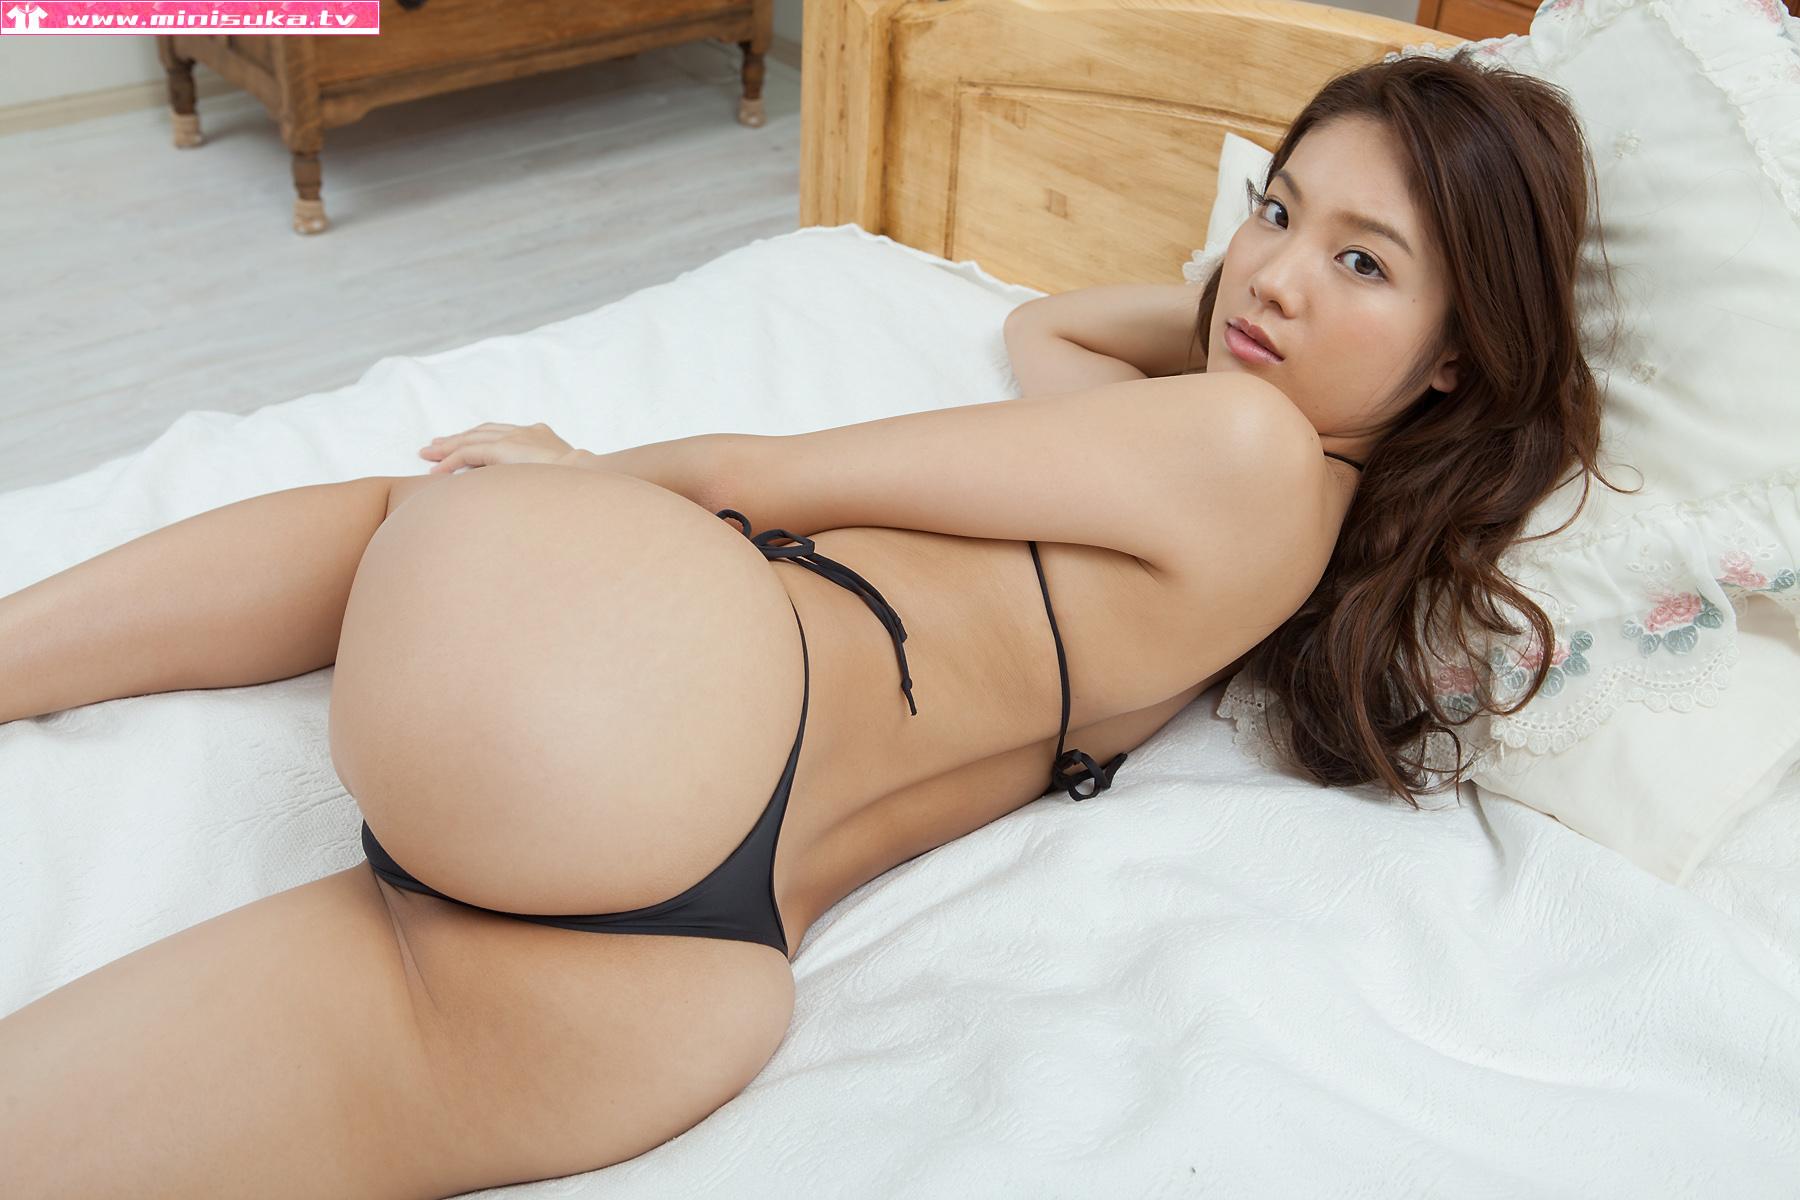 minisuka tv Kanzaki [Minisuka.tv] 2015-10-29 Tsukasa Kanzaki - Secret Gallery (STAGE2) 2.4  [16.9MB]